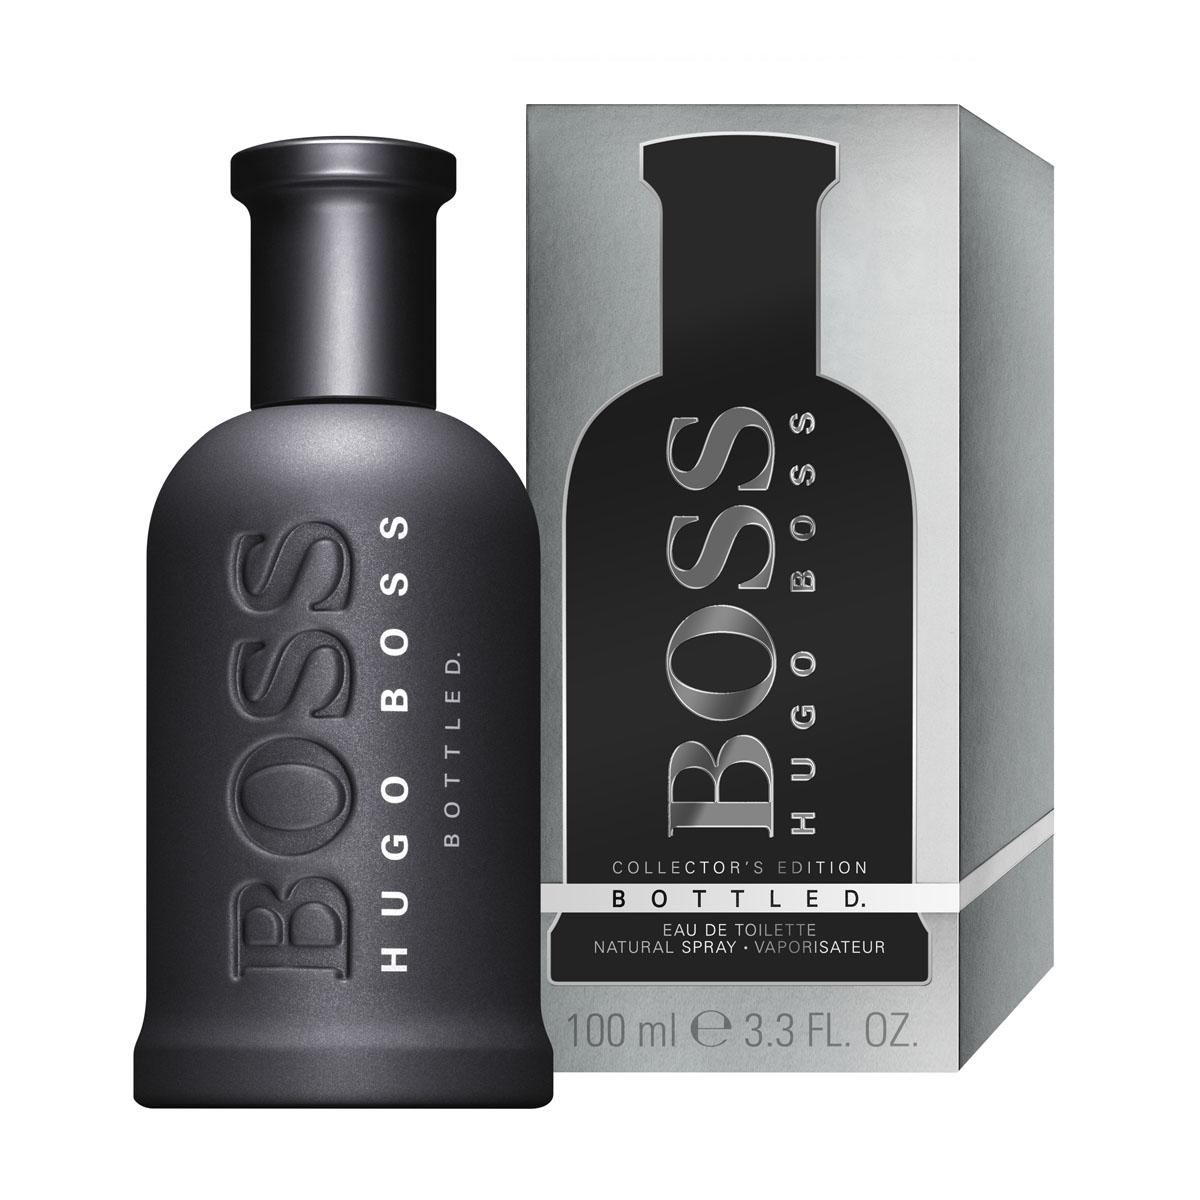 Hugo Boss Bottled Collectors Edition Туалетная вода 100 мл 0737052806266